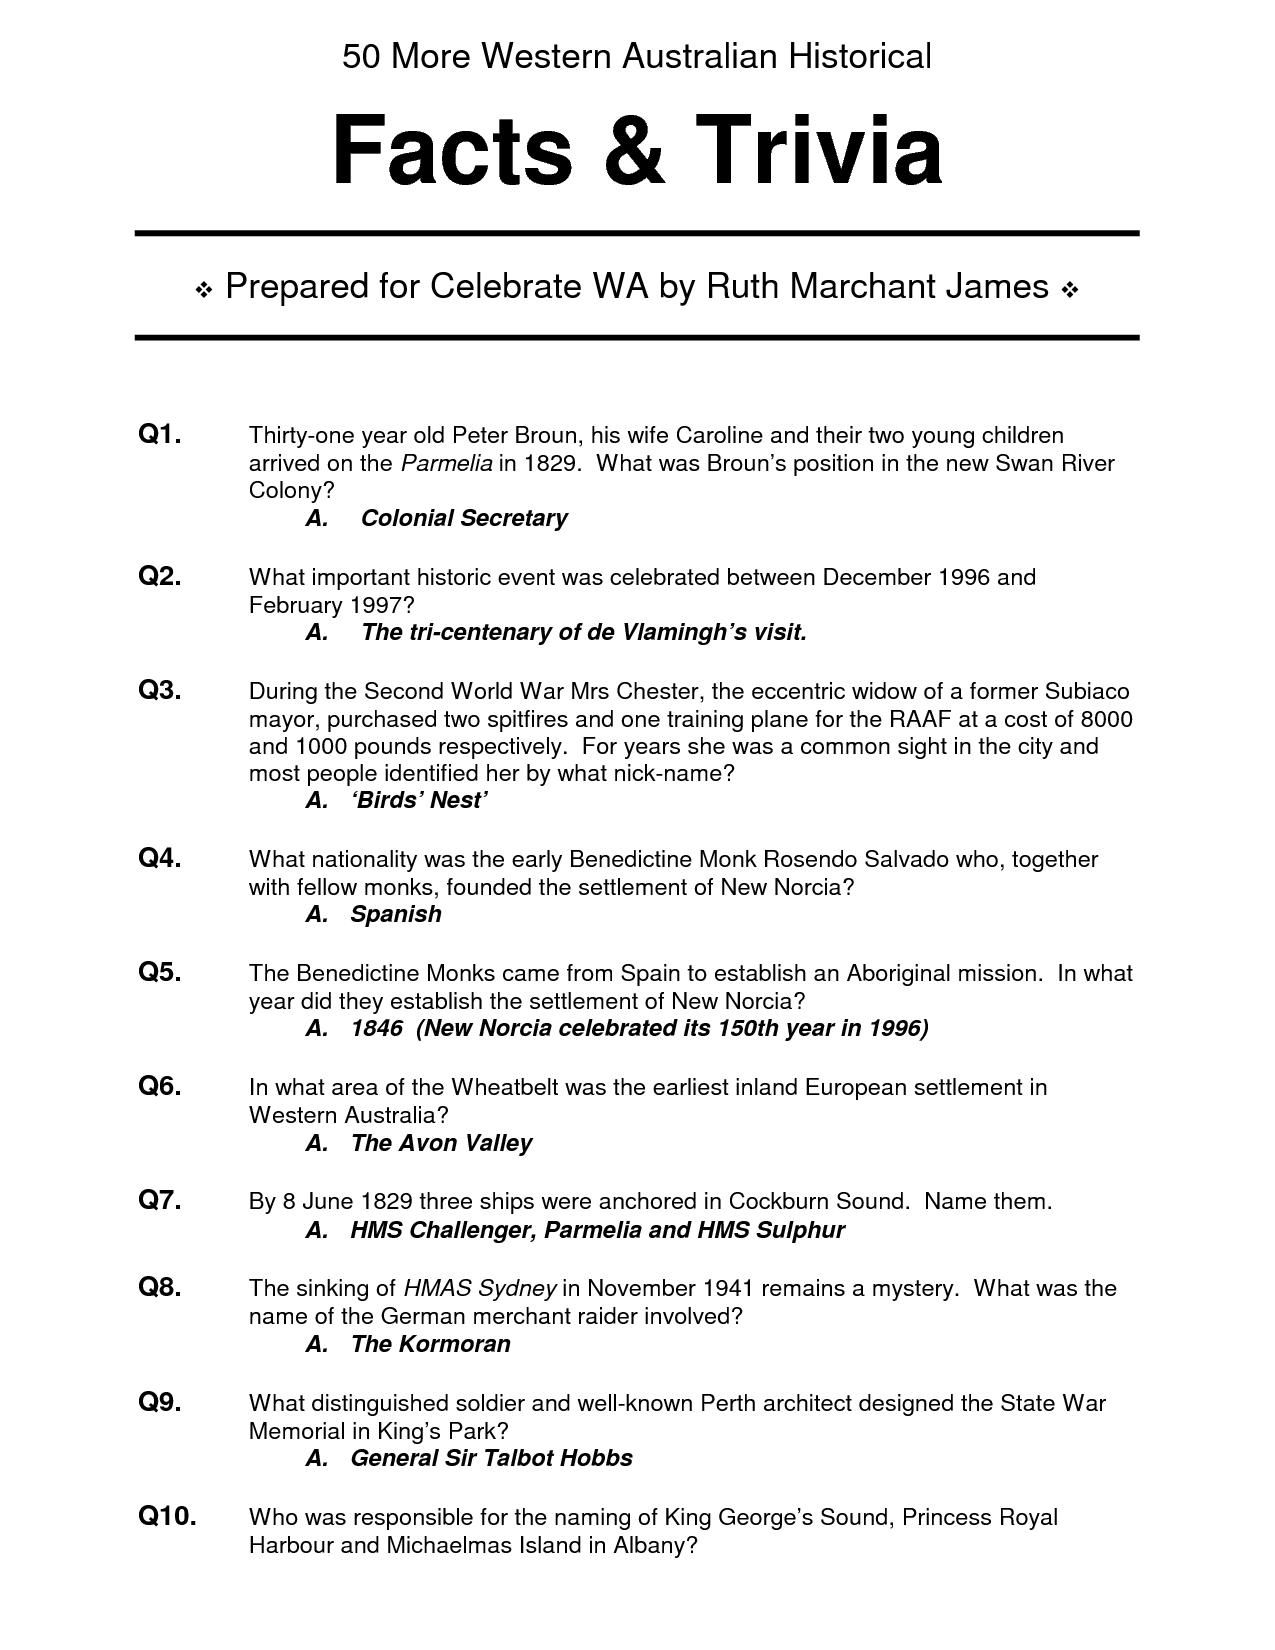 Halloween Quiz Questions Printable – Festival Collections - Free Printable Halloween Quiz